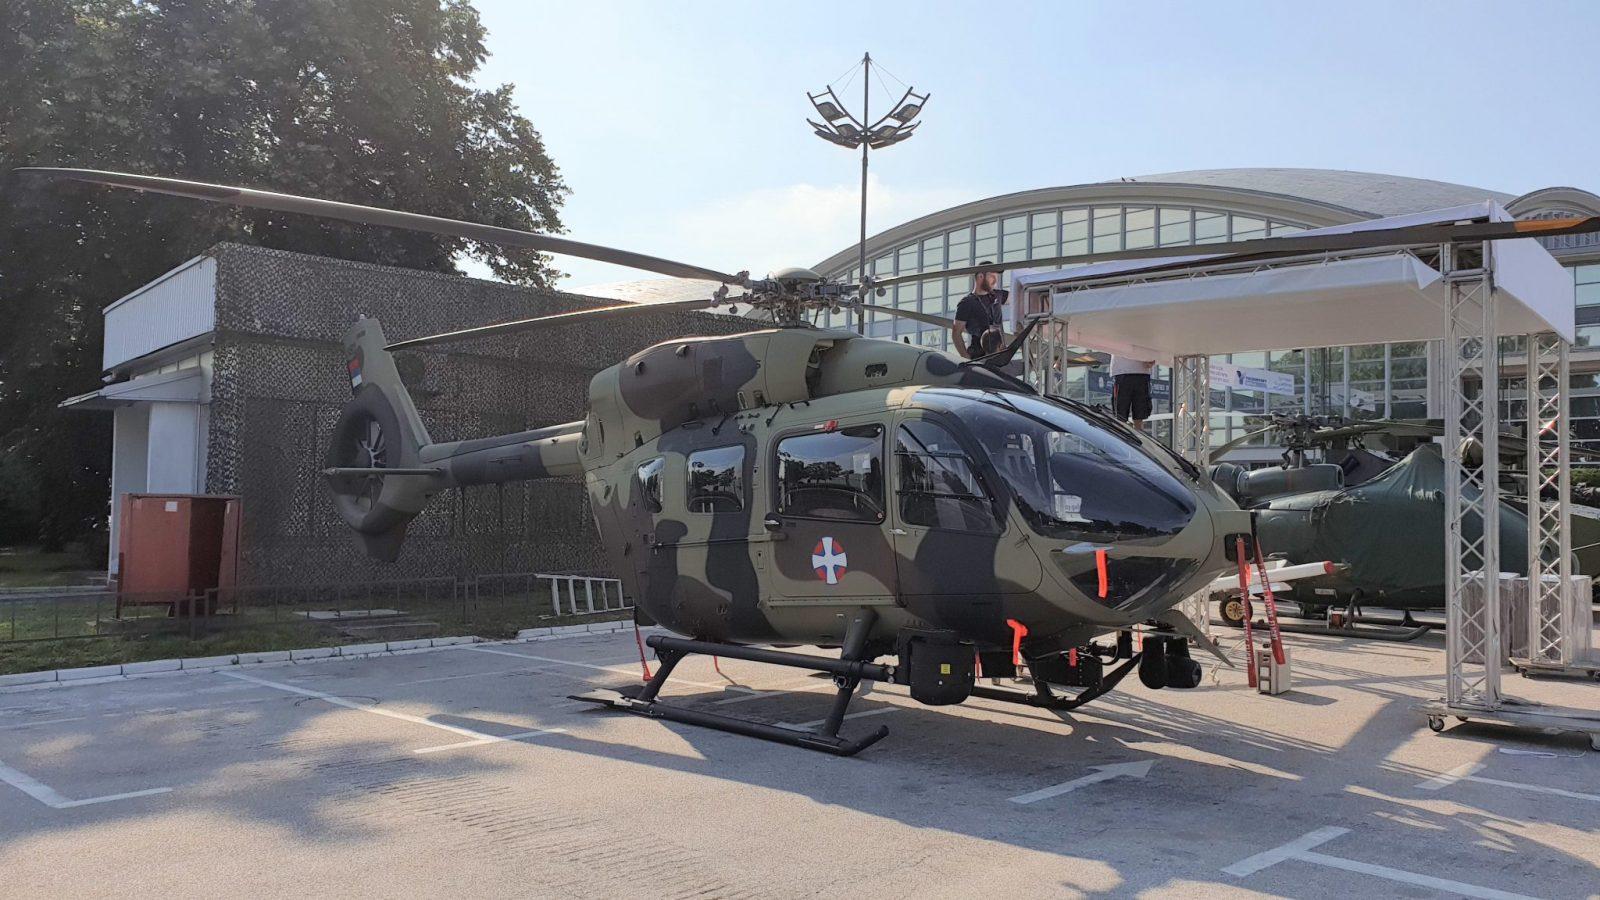 [PRVE FOTOGRAFIJE] Prvi H145M u Srbiji